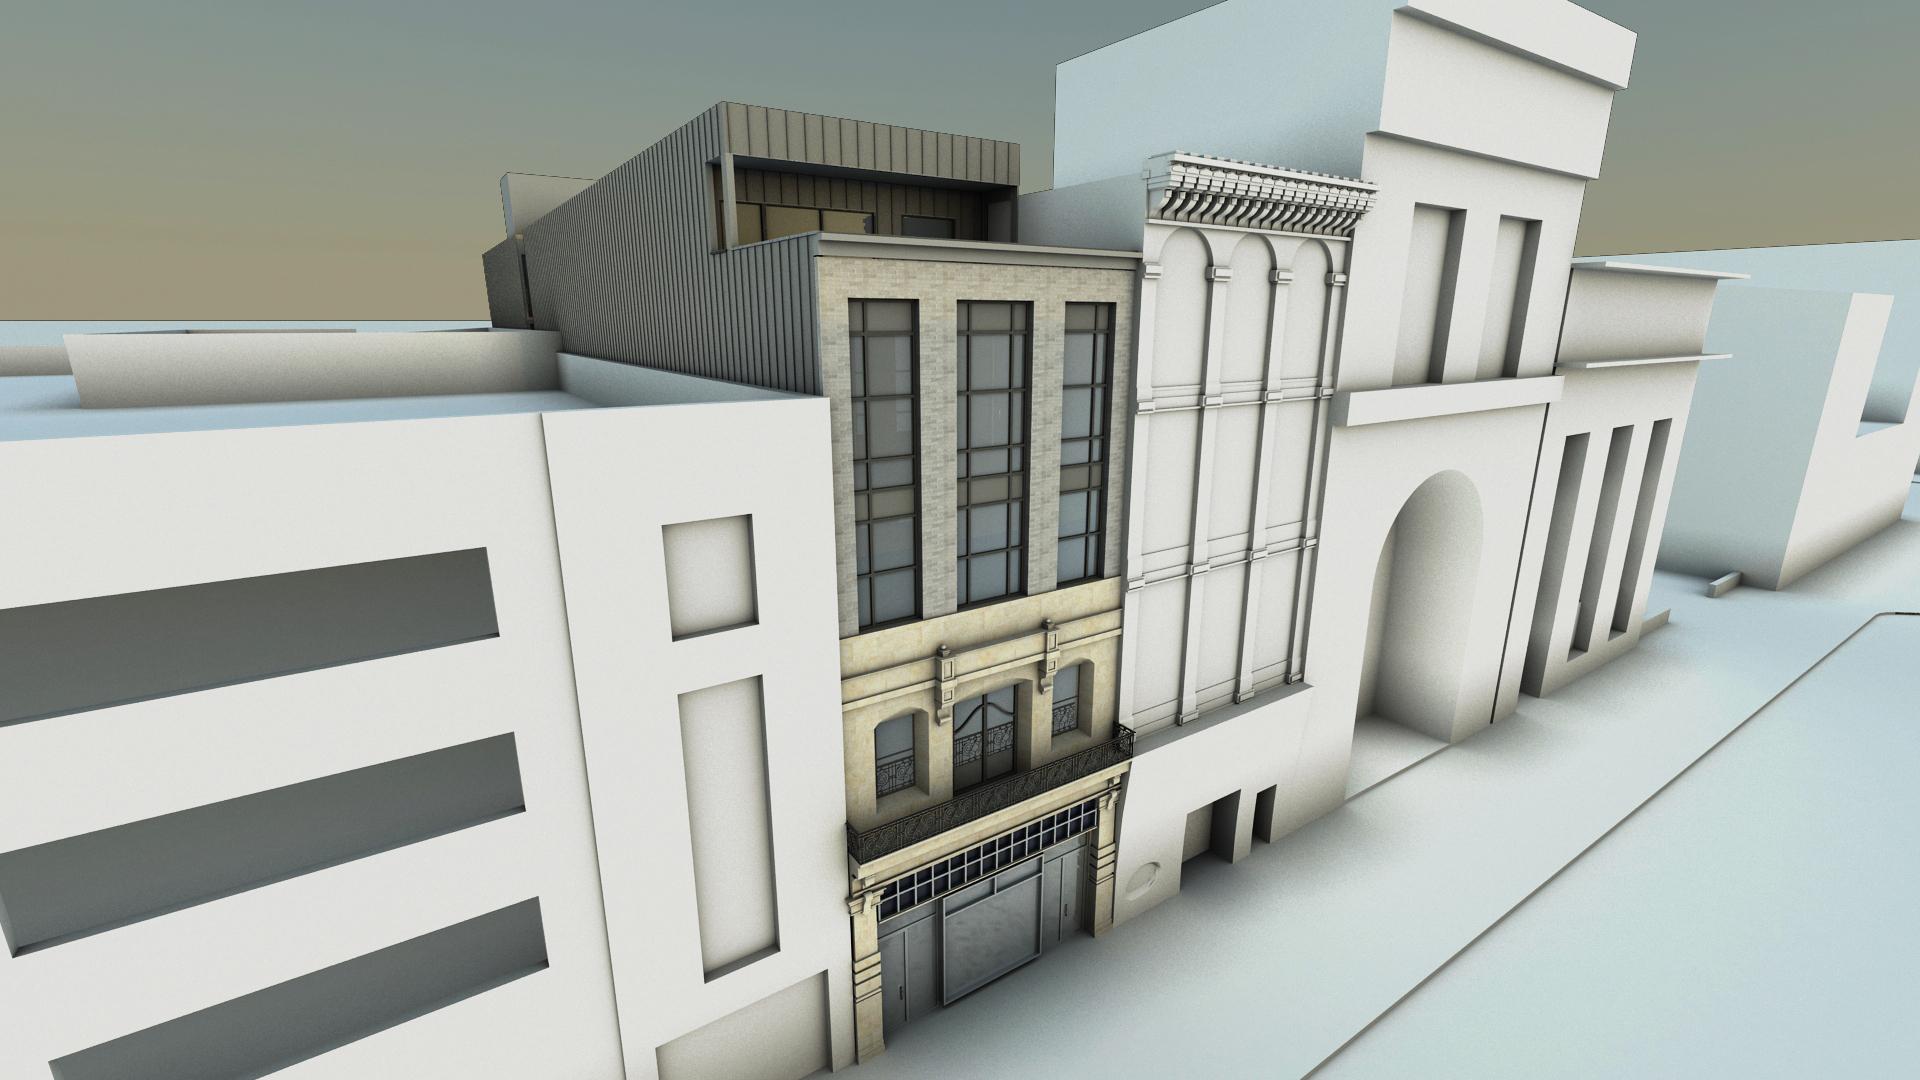 New life for the philadelphia blueprint company on chestnut street rendering of 725 chestnut street via urban space development inc malvernweather Images